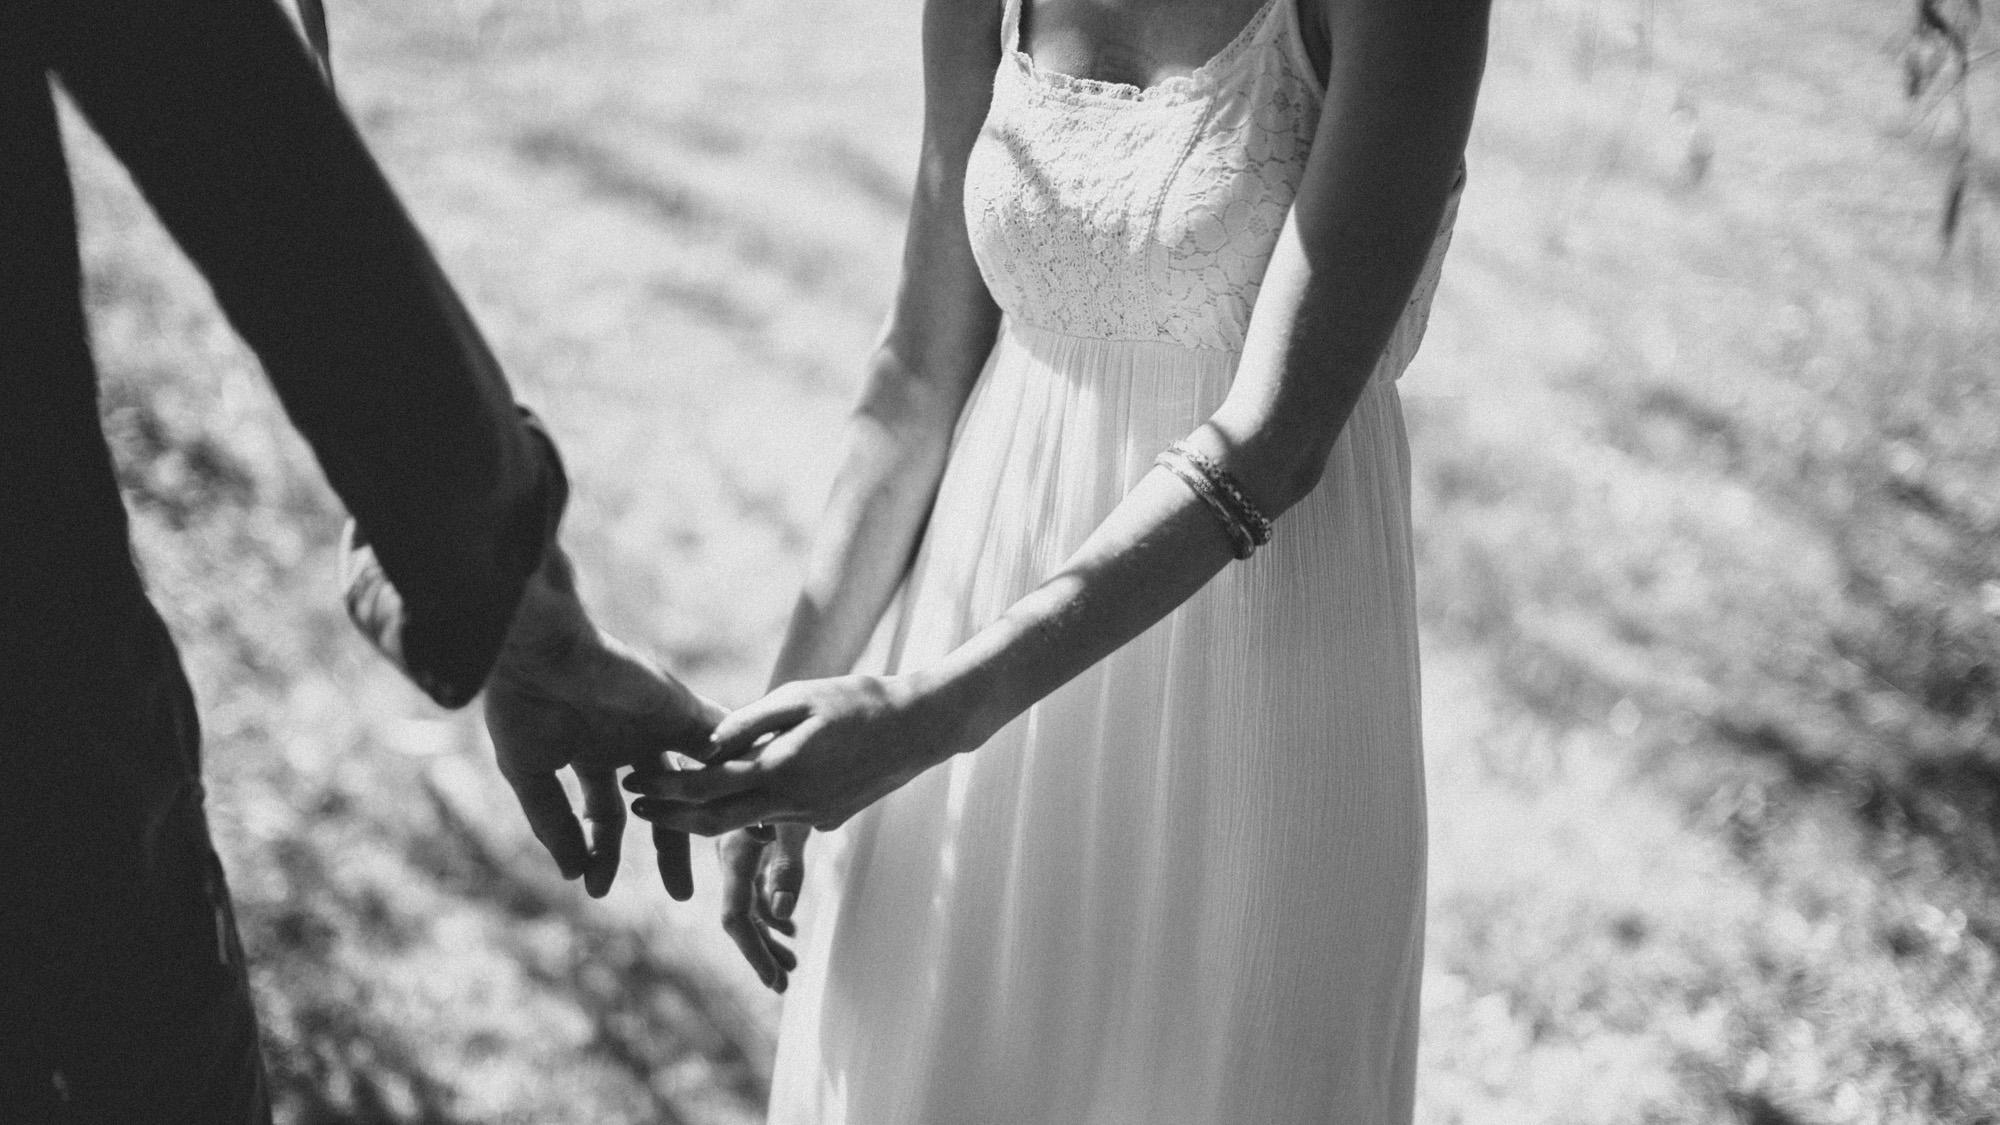 alec_vanderboom_springfield_missouri_wedding-0023.jpg